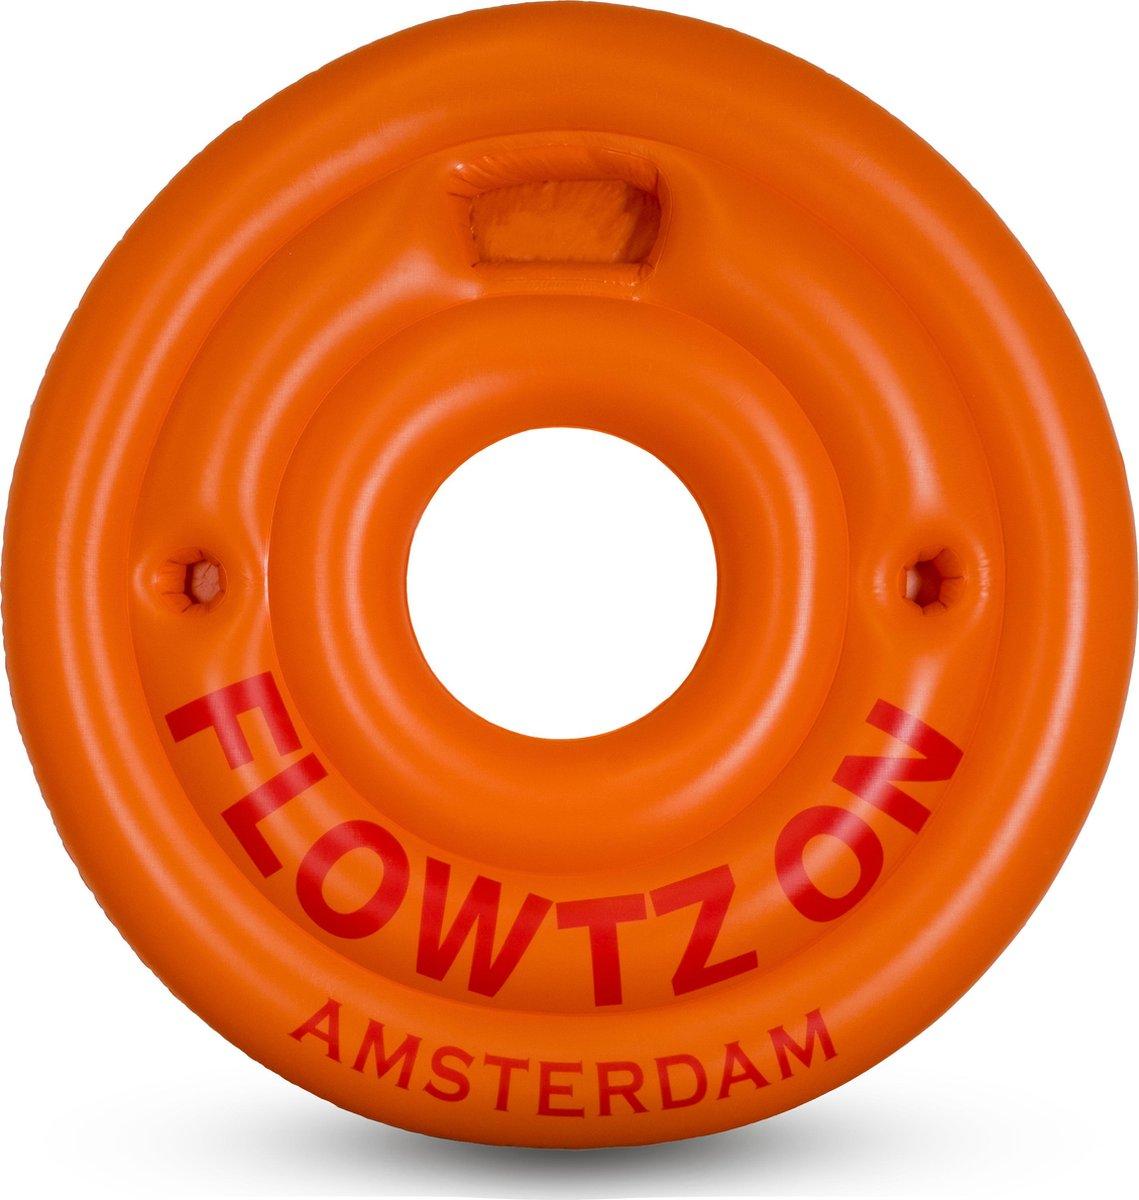 Flowtz On - Zwemband - Opblaasbaar - Oranje - 180 cm - Groot - Zomer - Strand - Zwembad